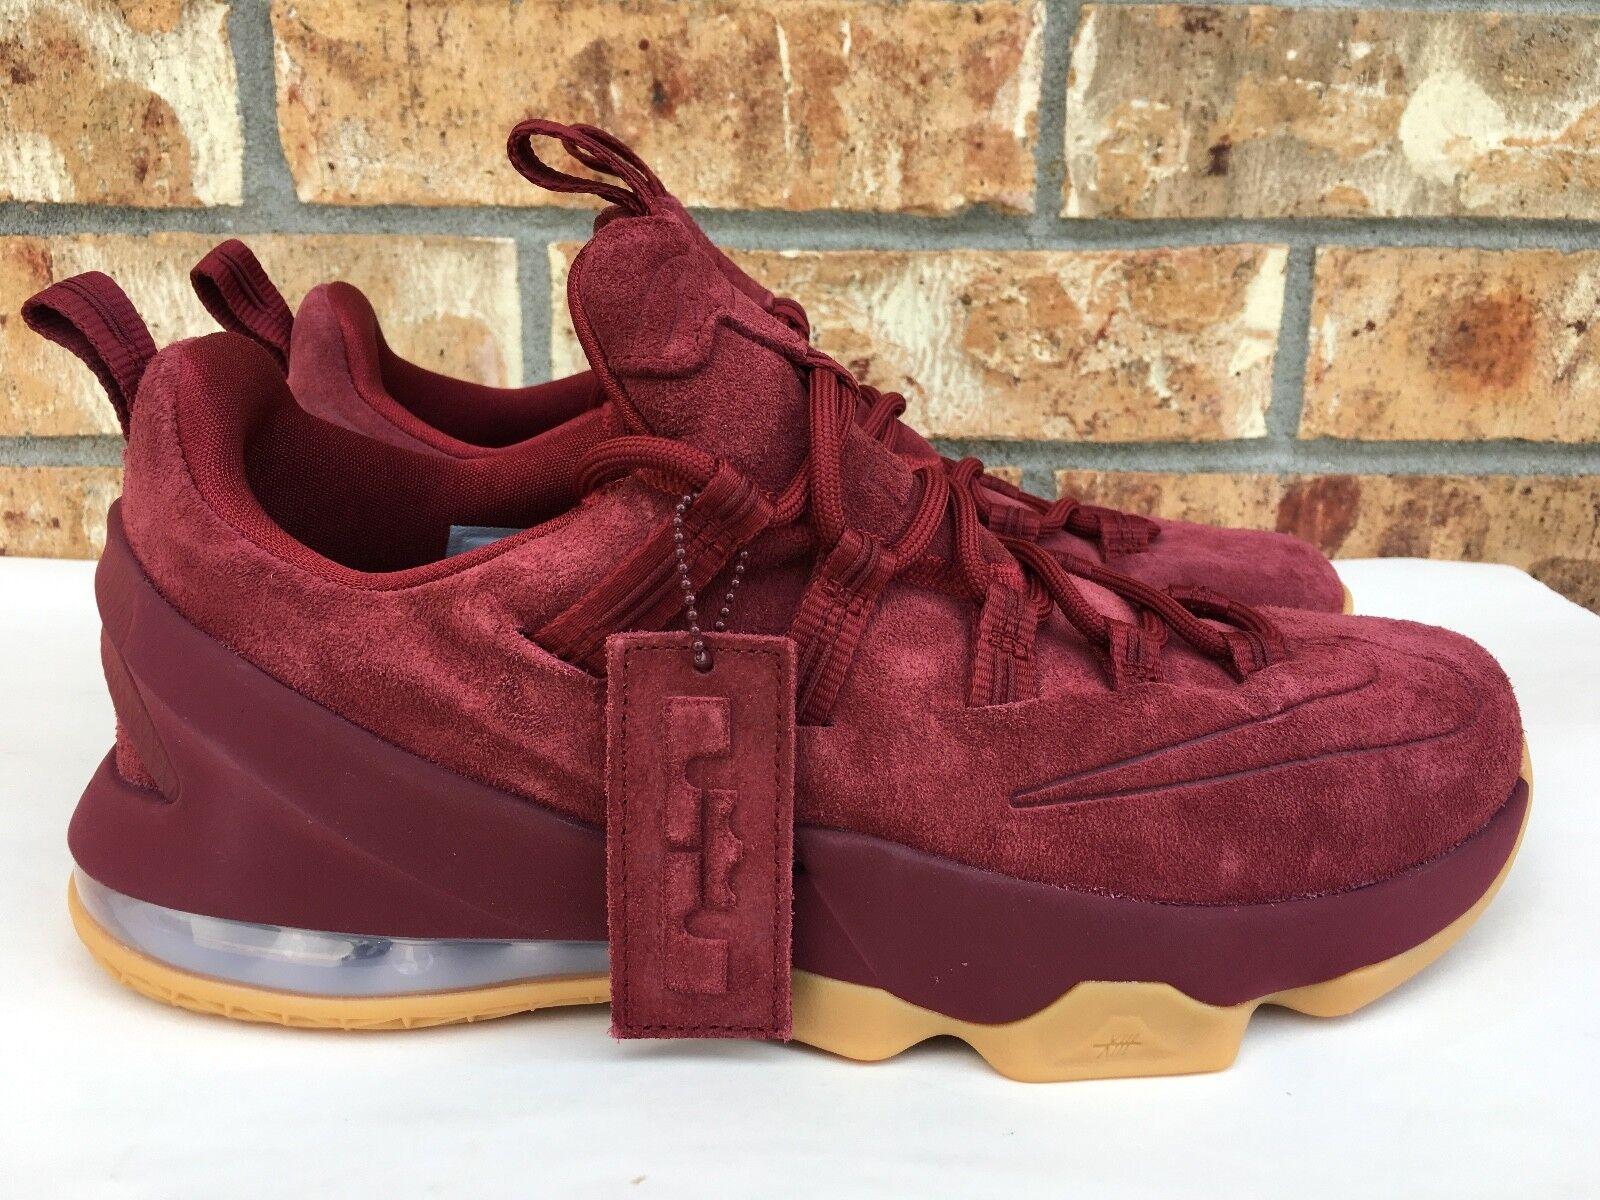 Men's Nike Lebron 13 Low PRM Team Red Suede Premium Basketball Shoes AH8289 600